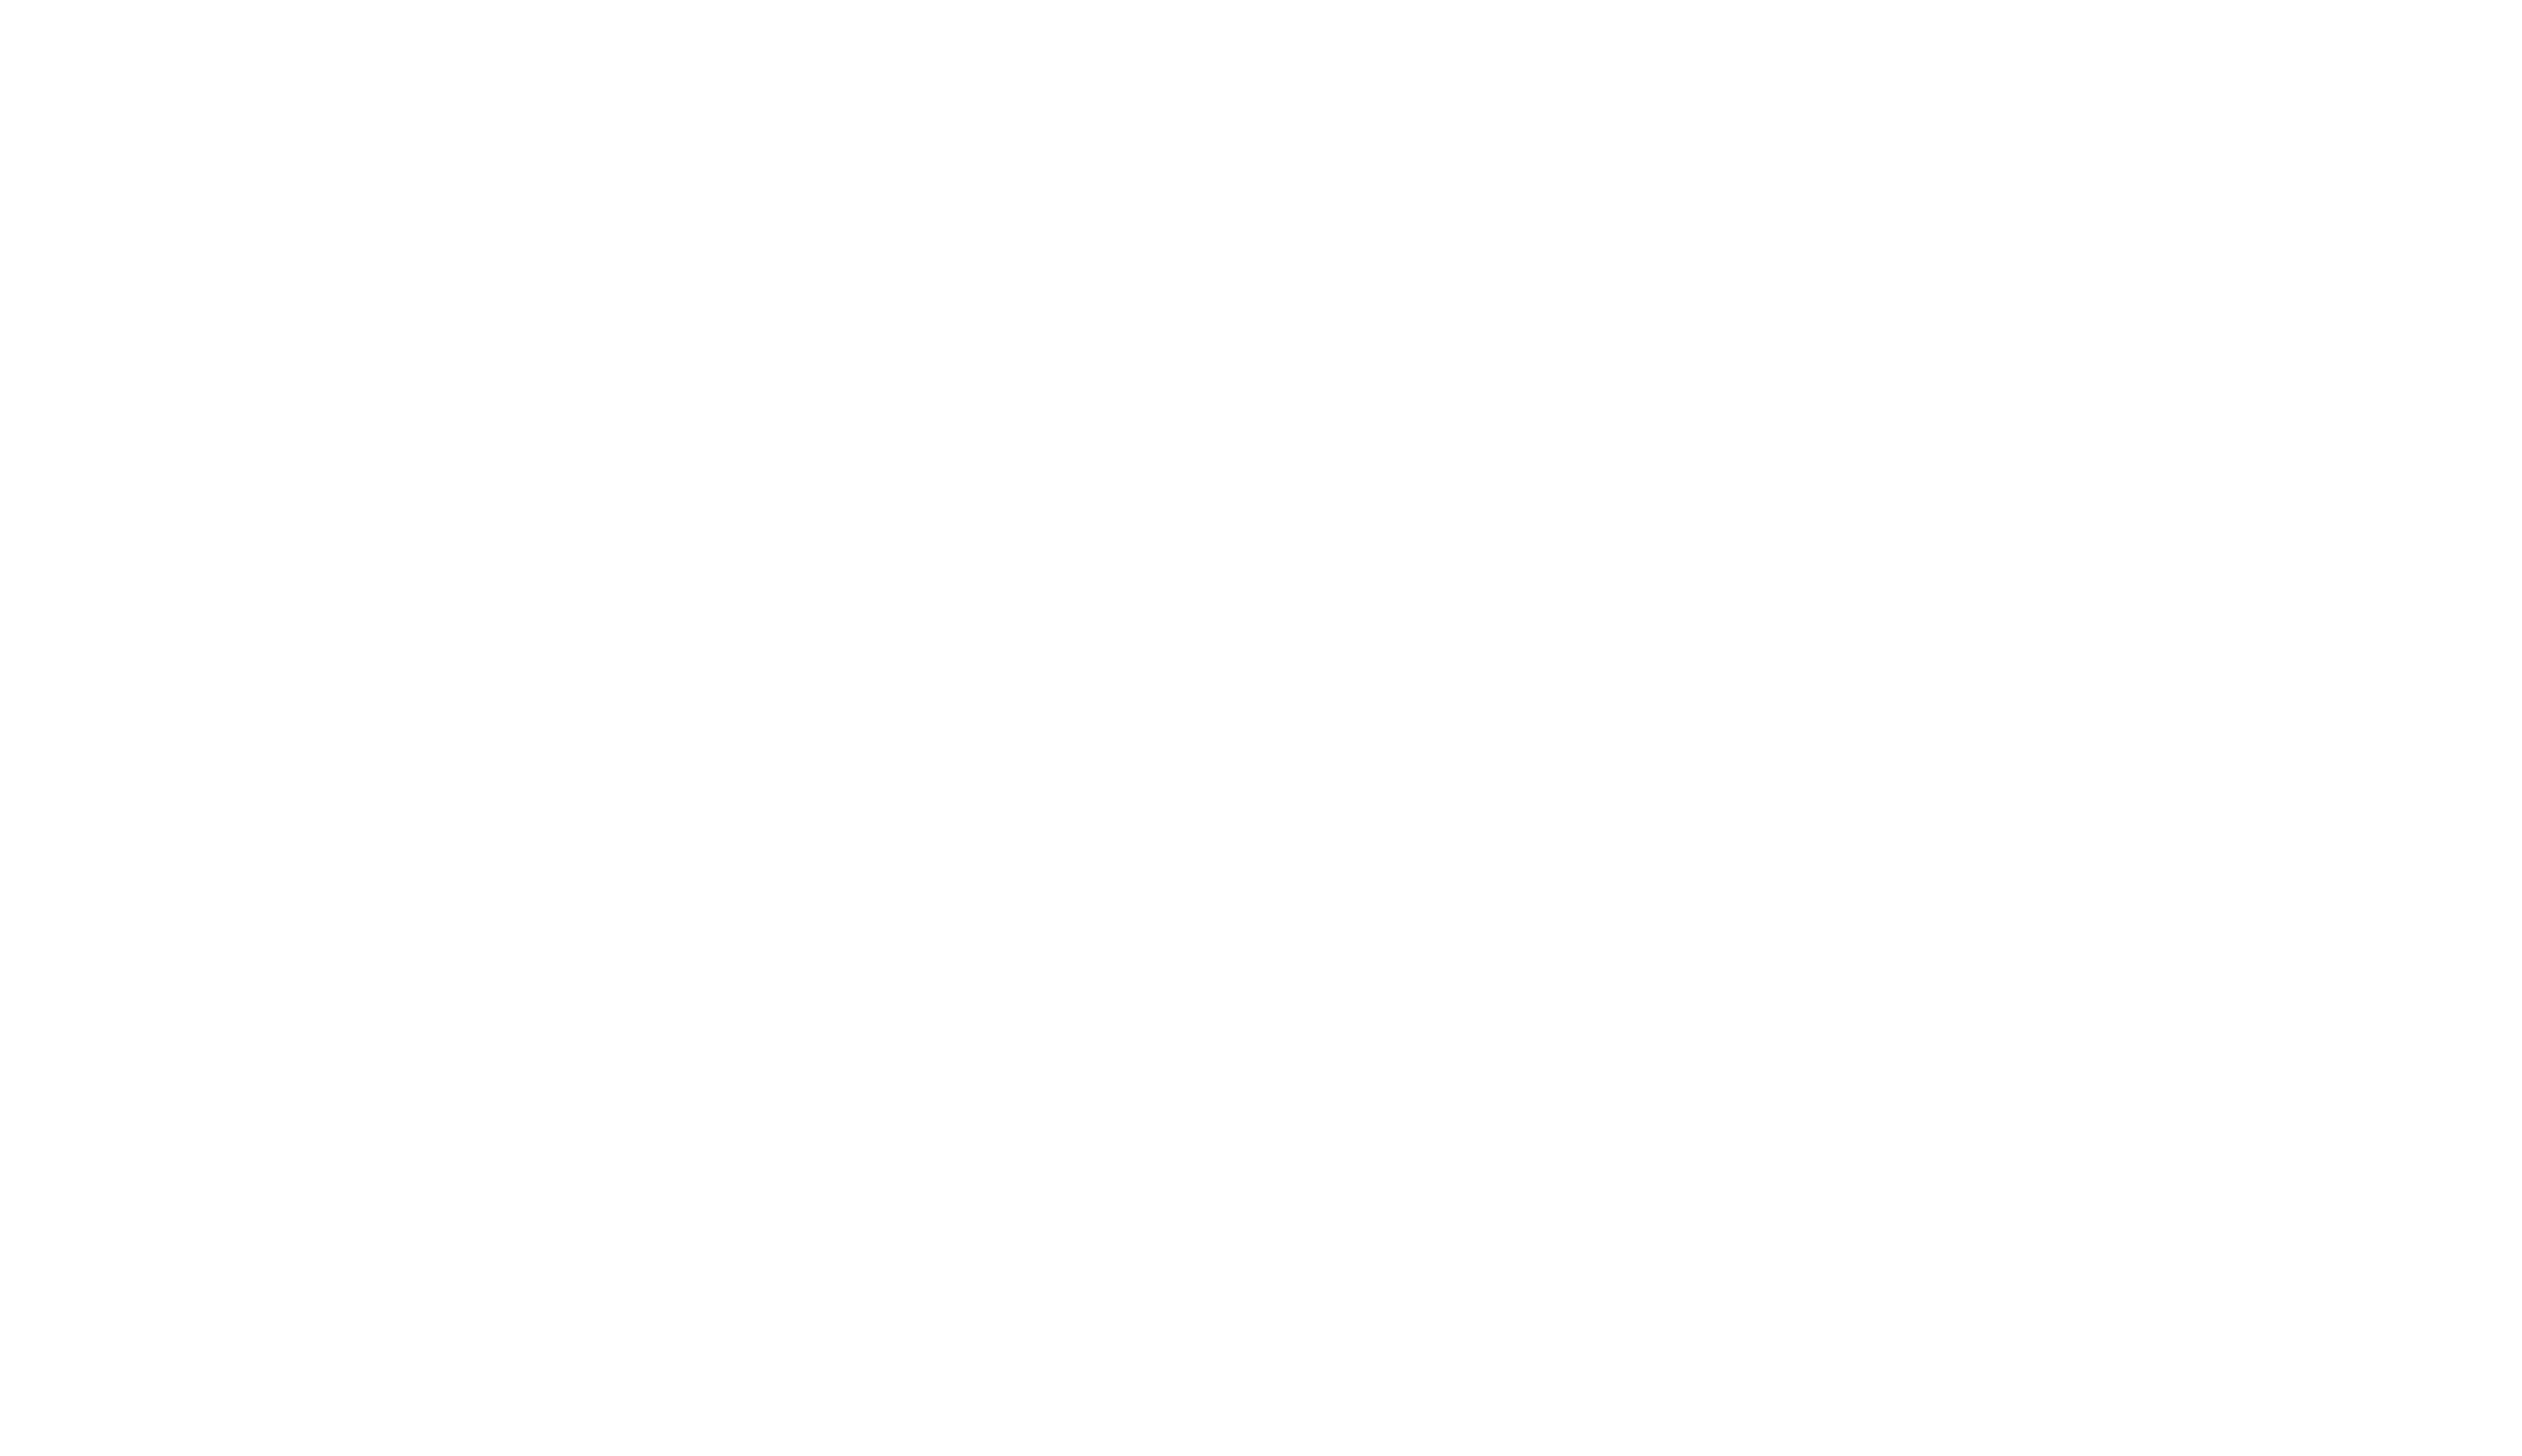 Garten-Management Schäfer